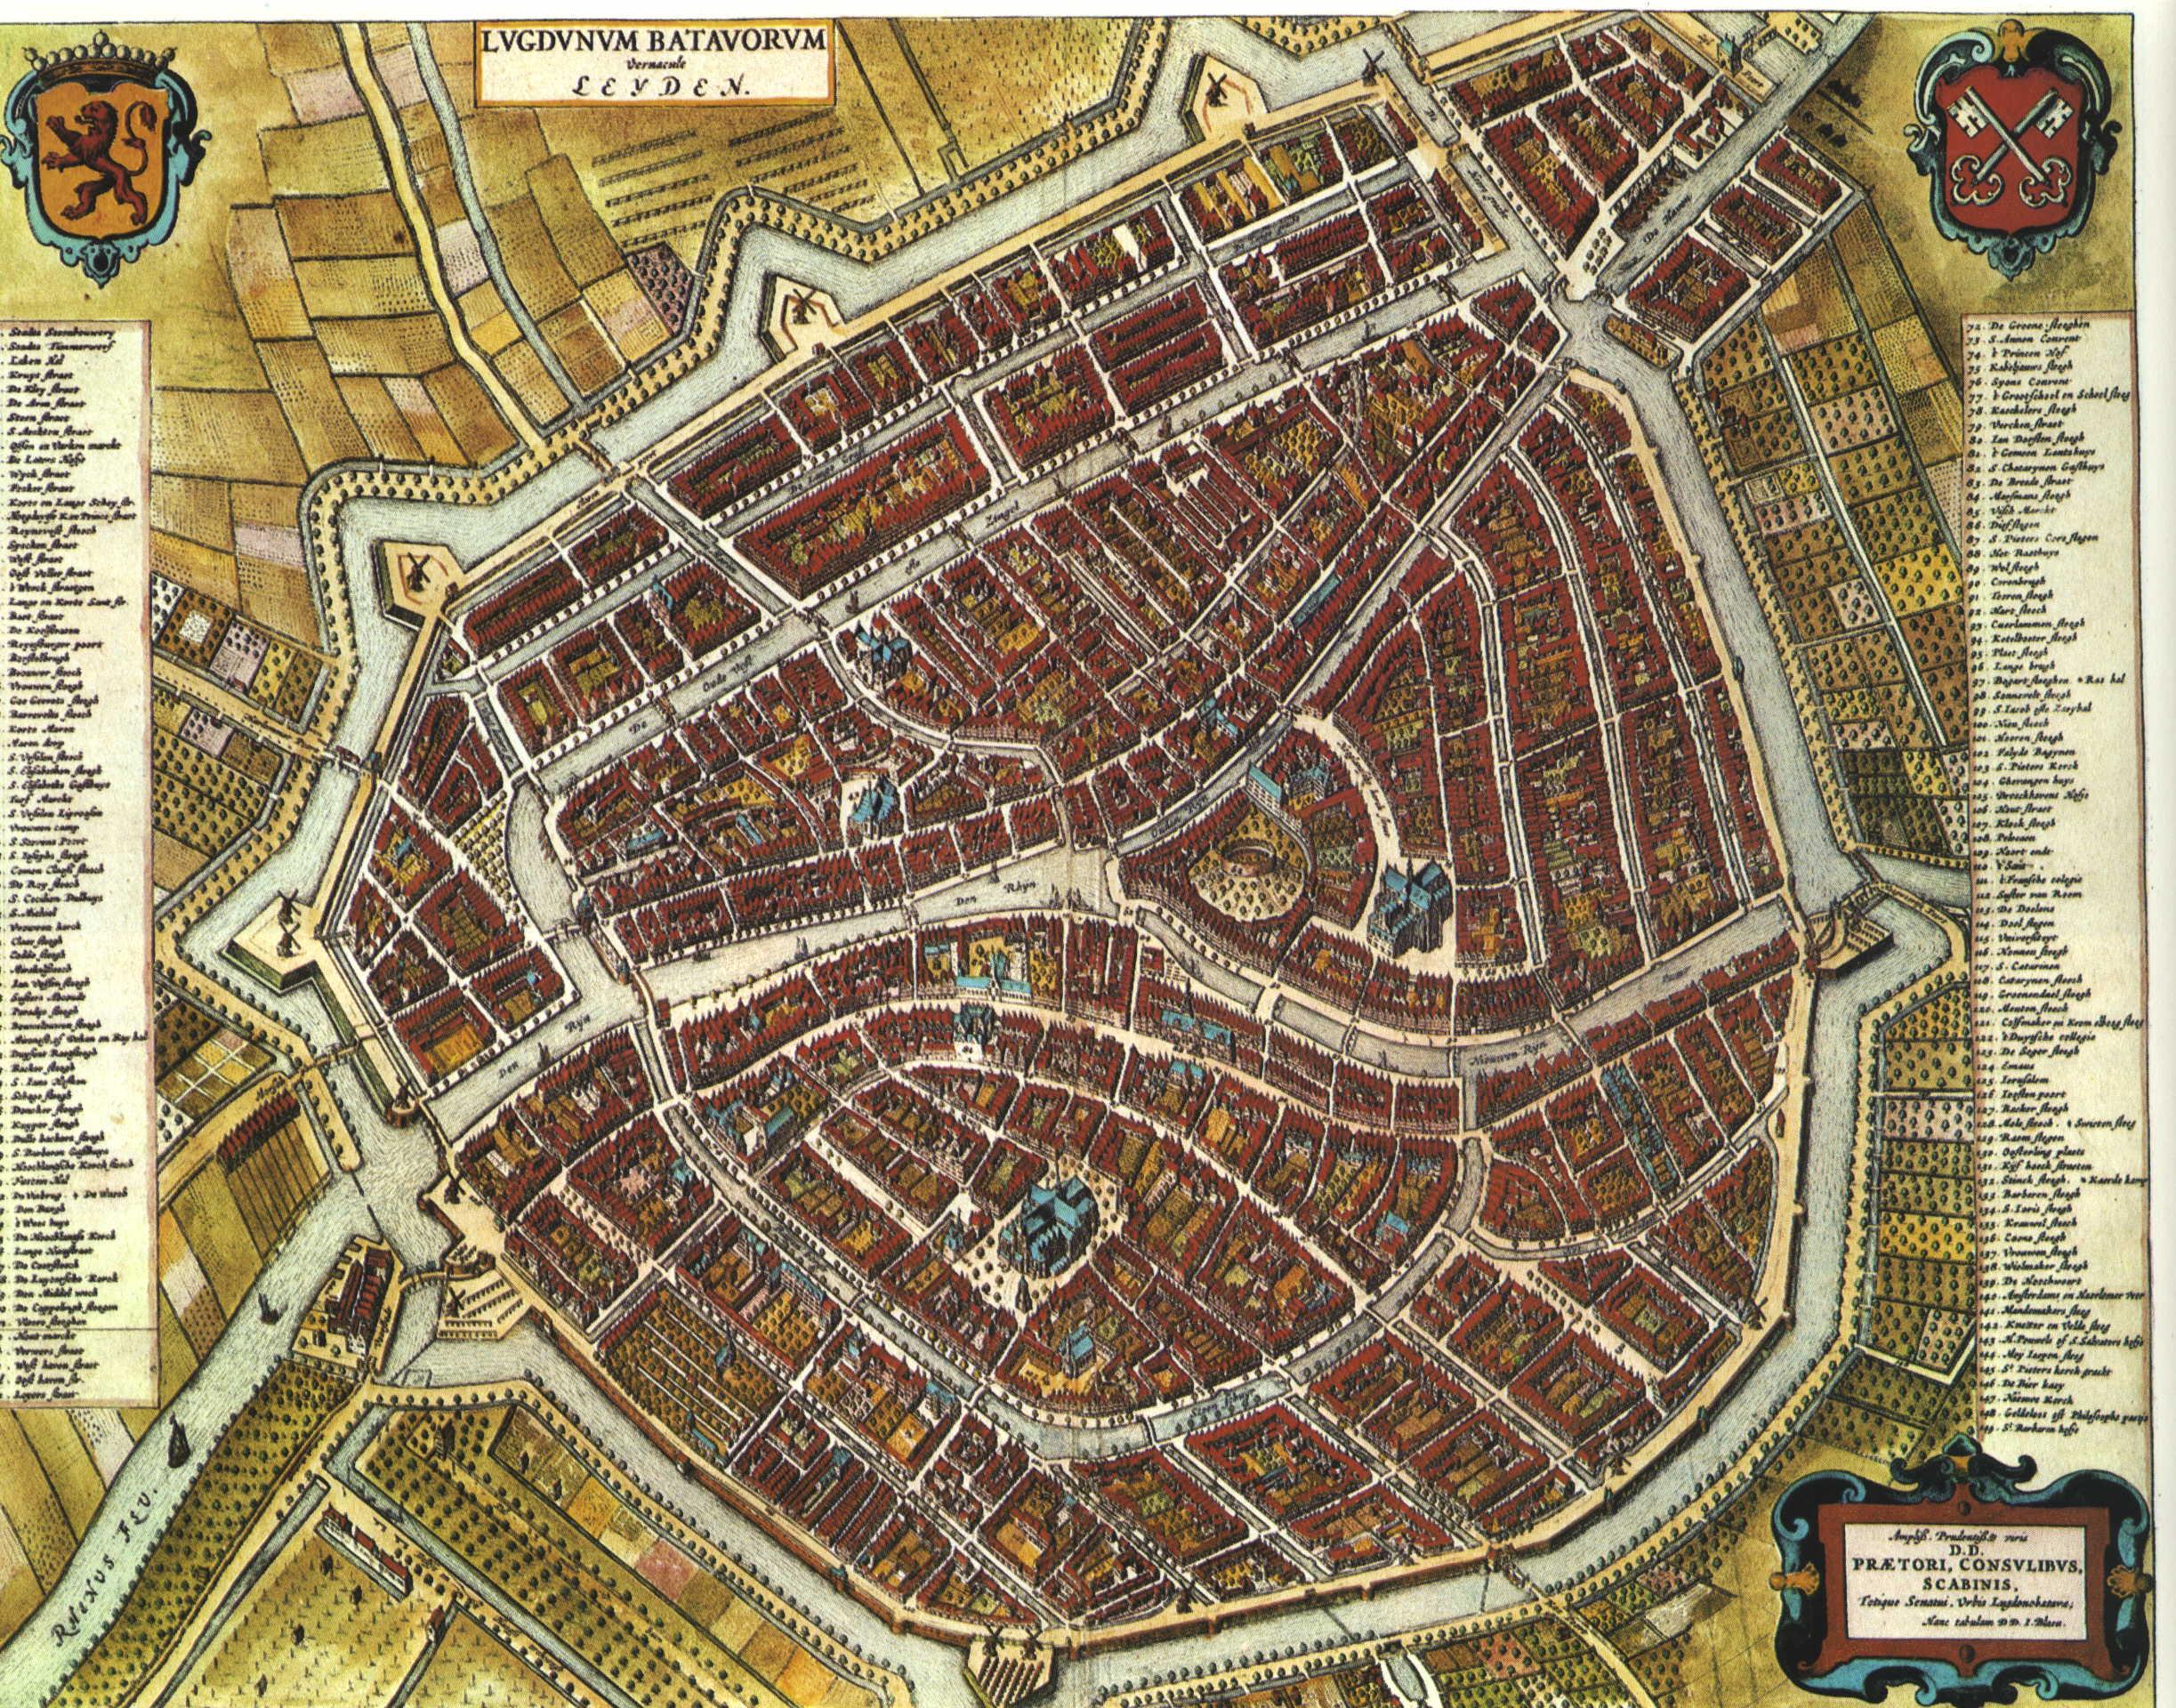 FileBlaeu 1652 Leidenjpg Wikimedia Commons